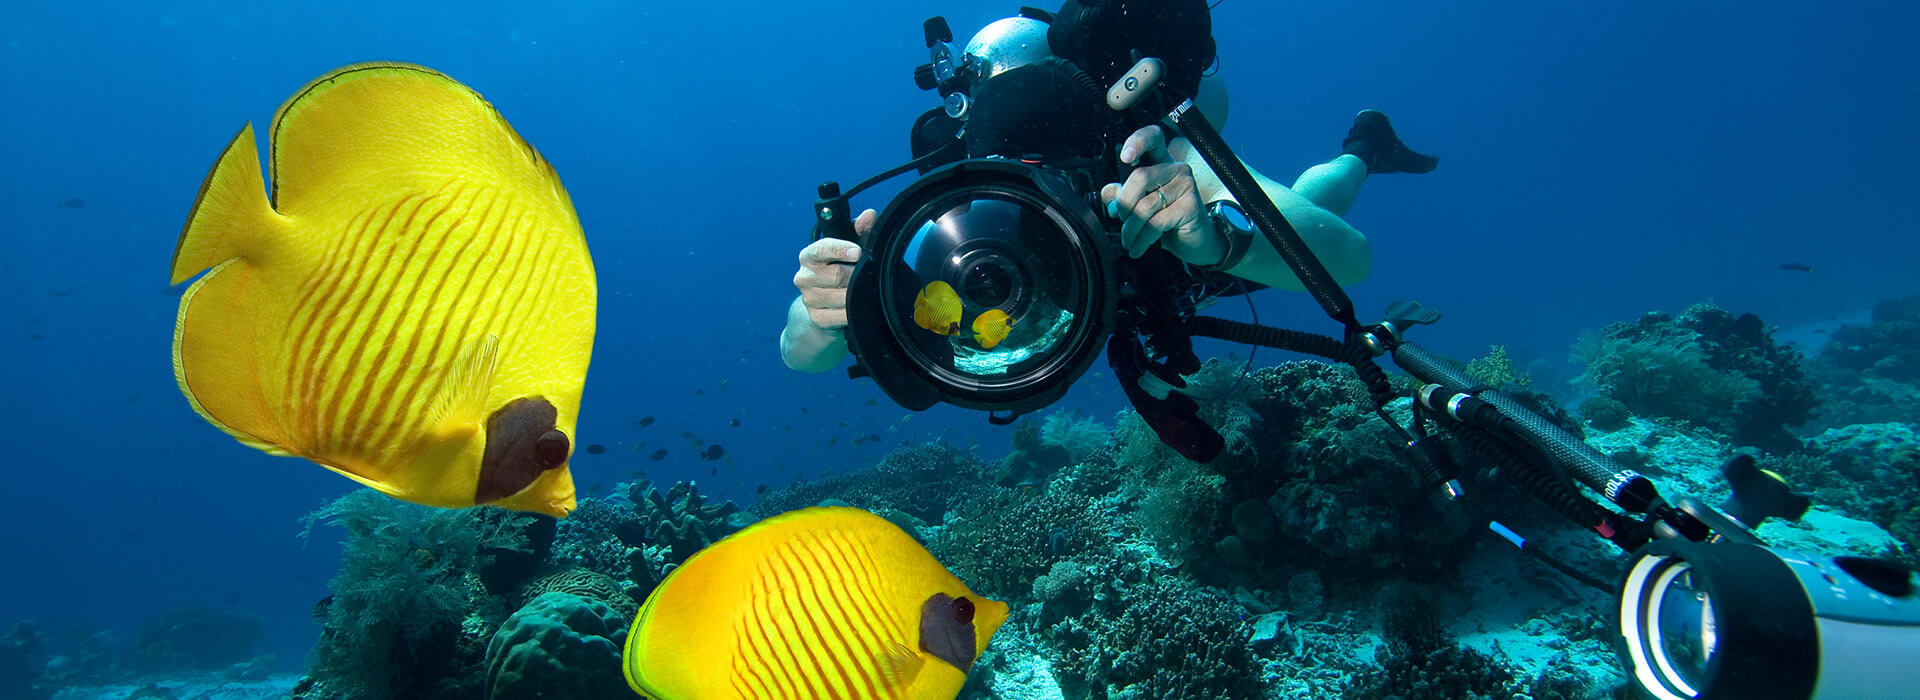 scuba diving yellow fish